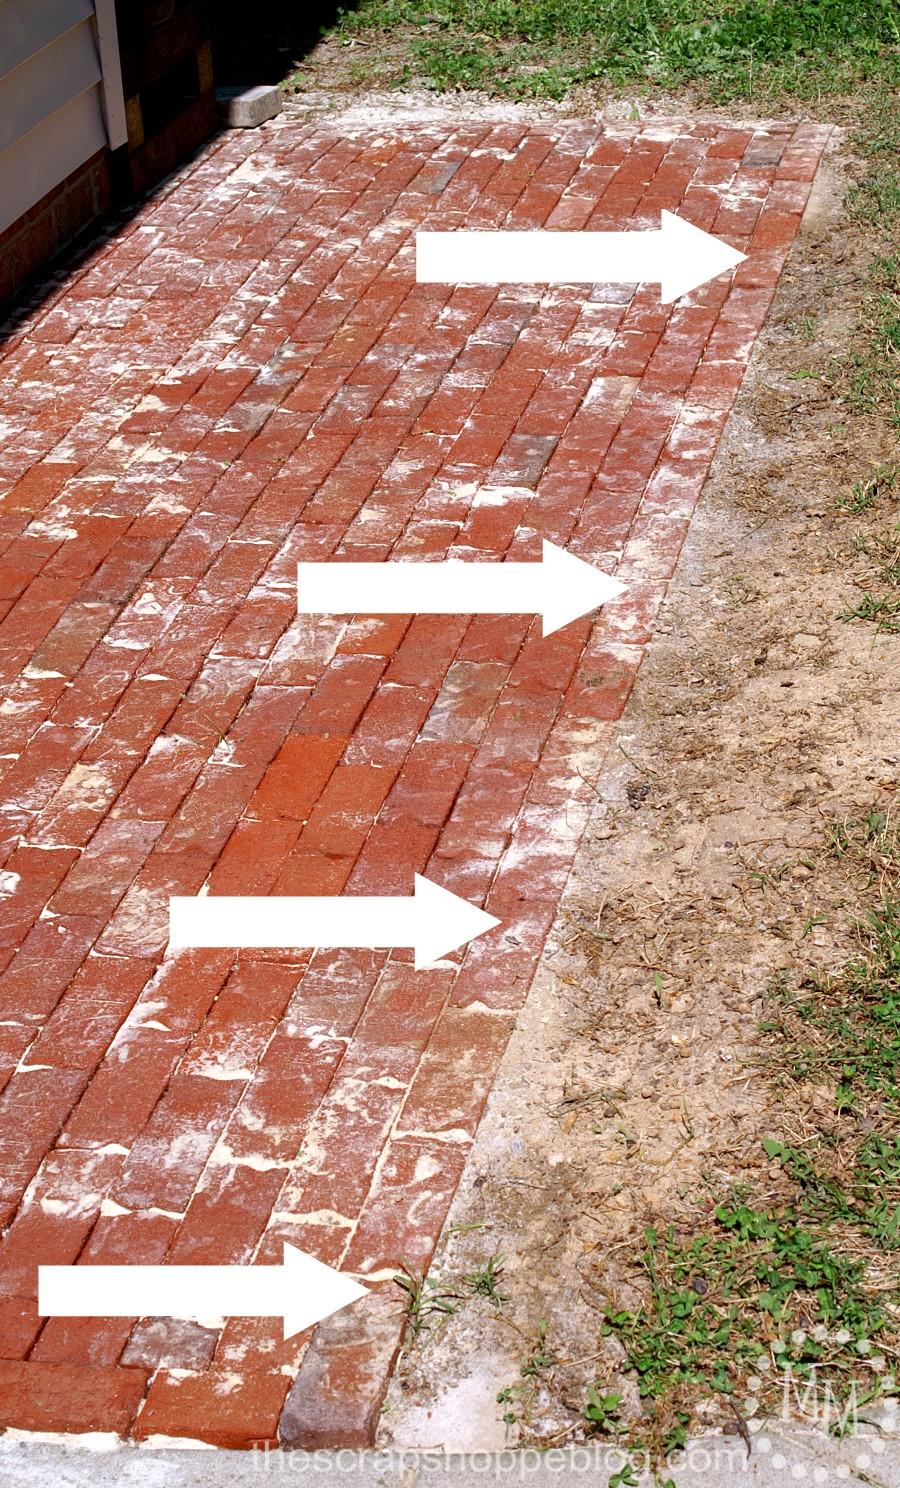 How to Build a Brick Patio - The Scrap Shoppe